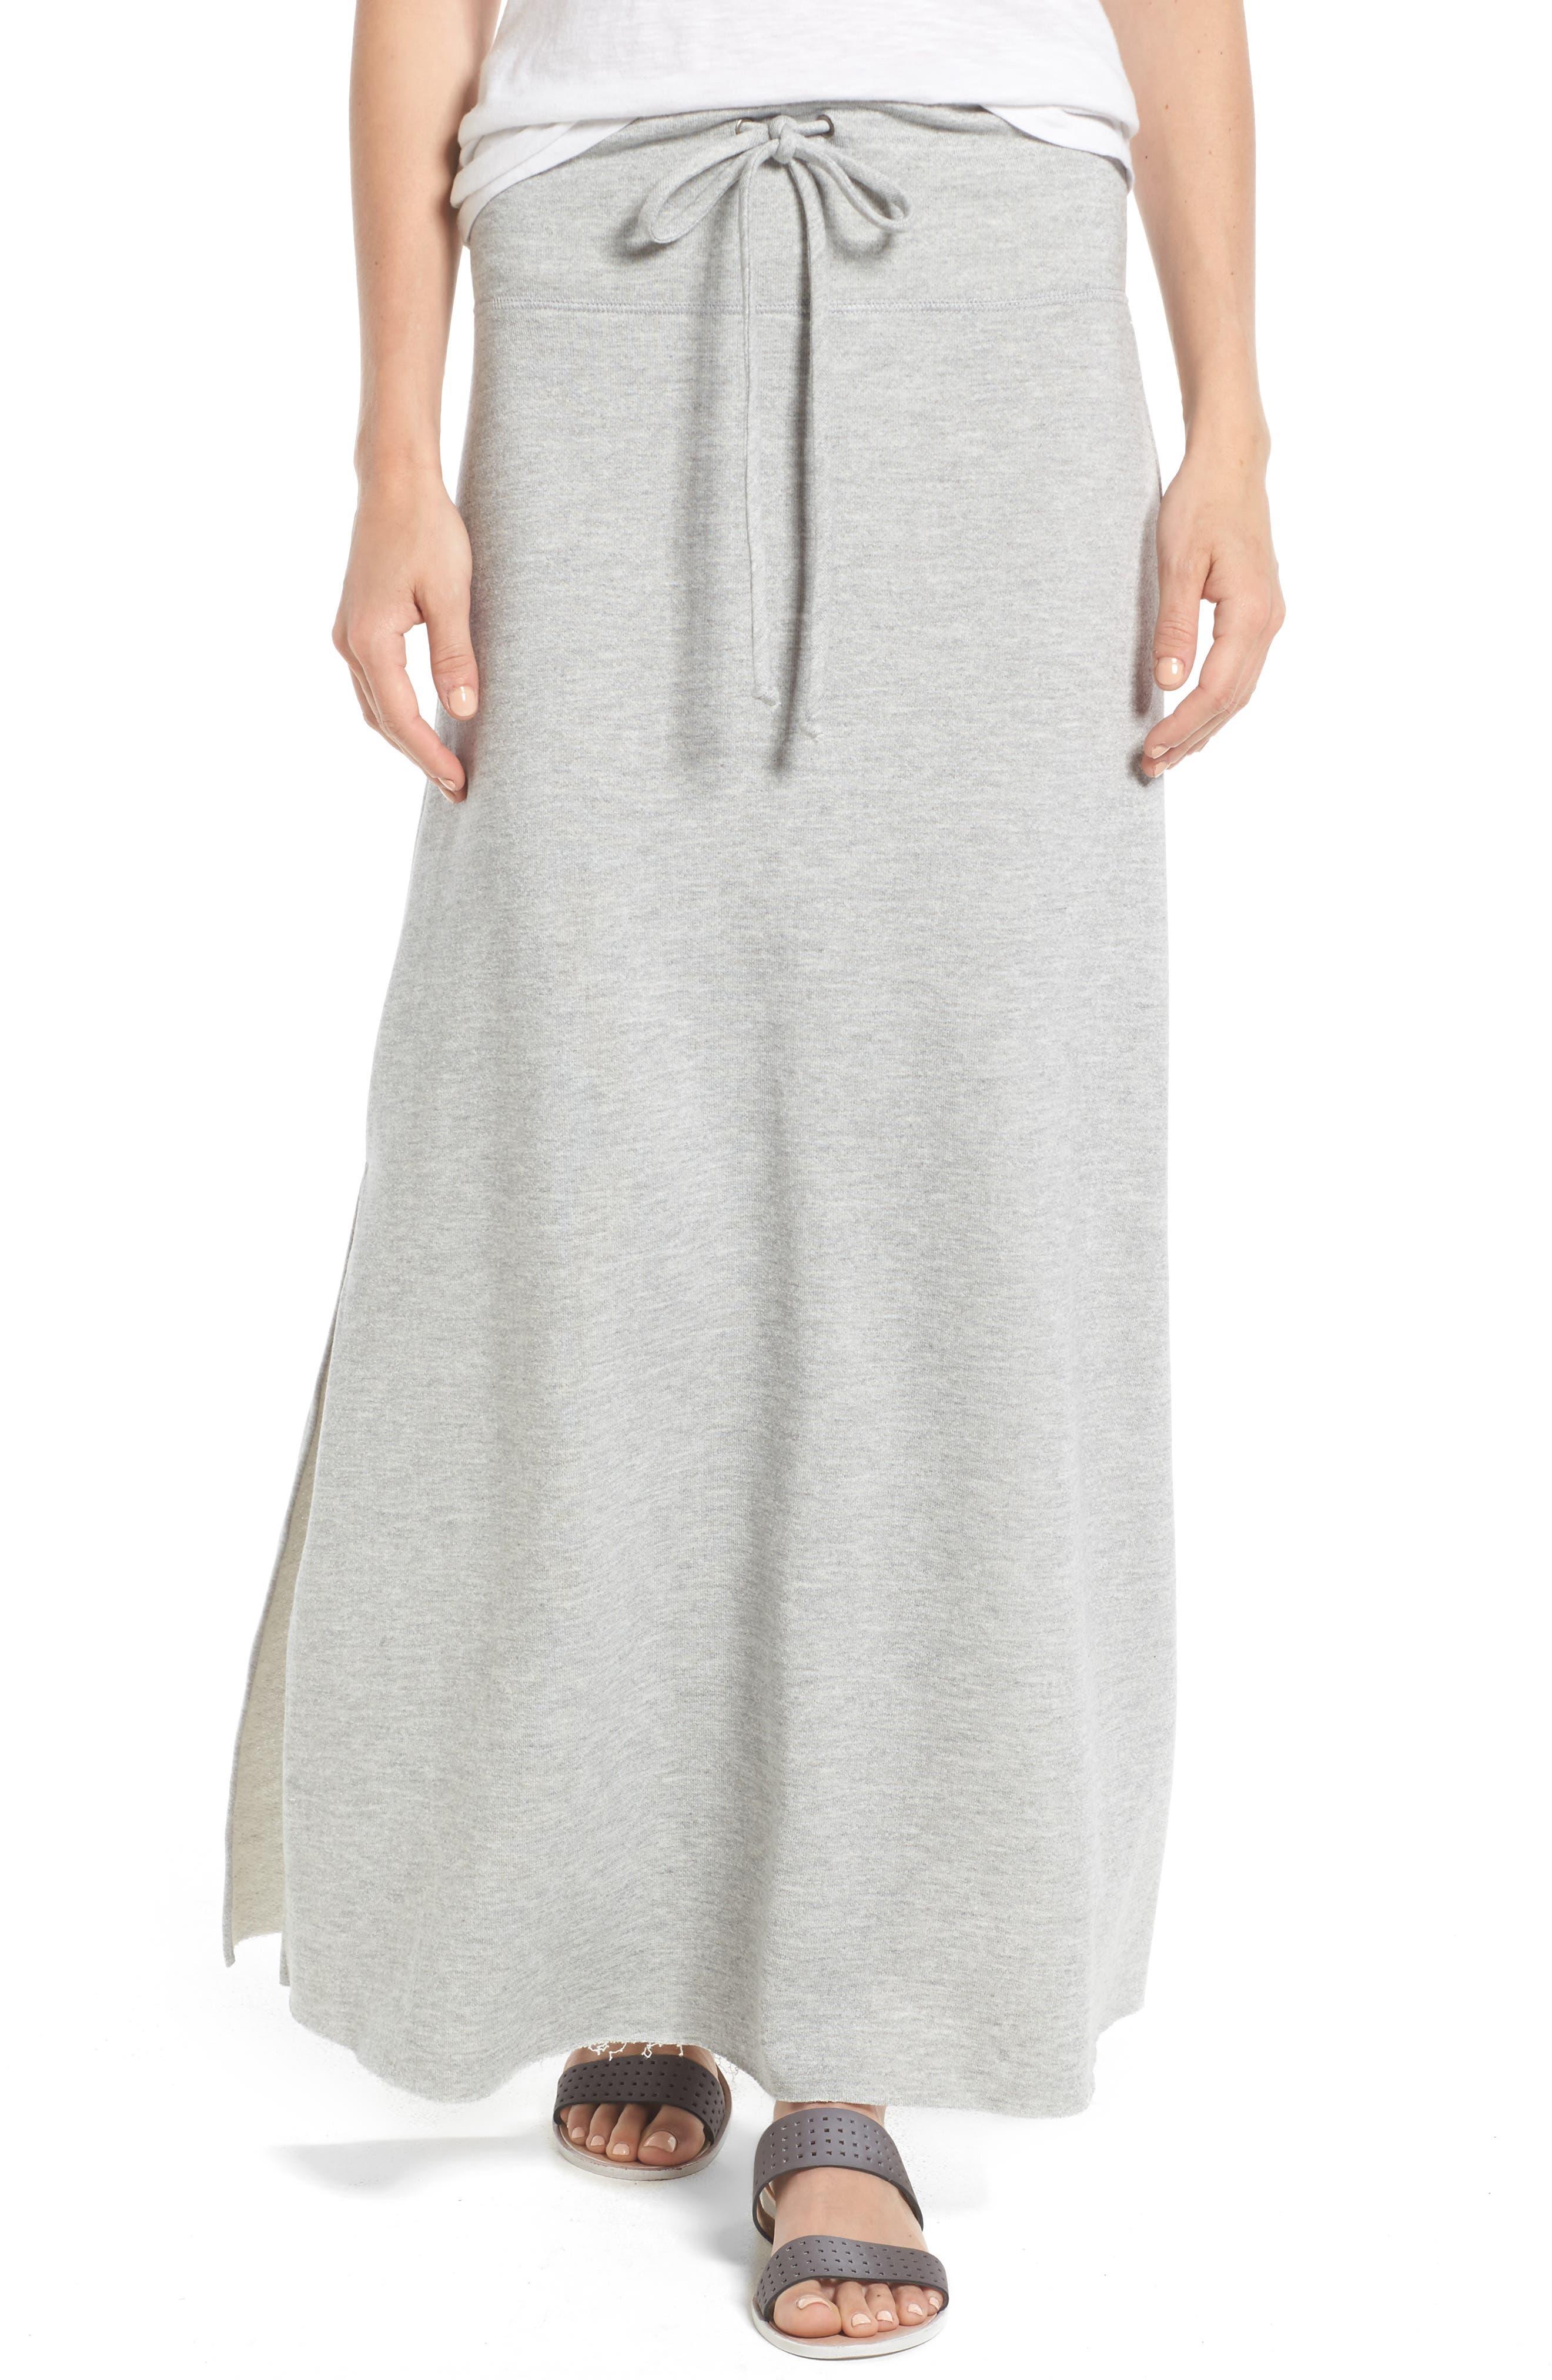 Alternate Image 1 Selected - Caslon® Drawstring Knit Maxi Skirt (Regular & Petite)